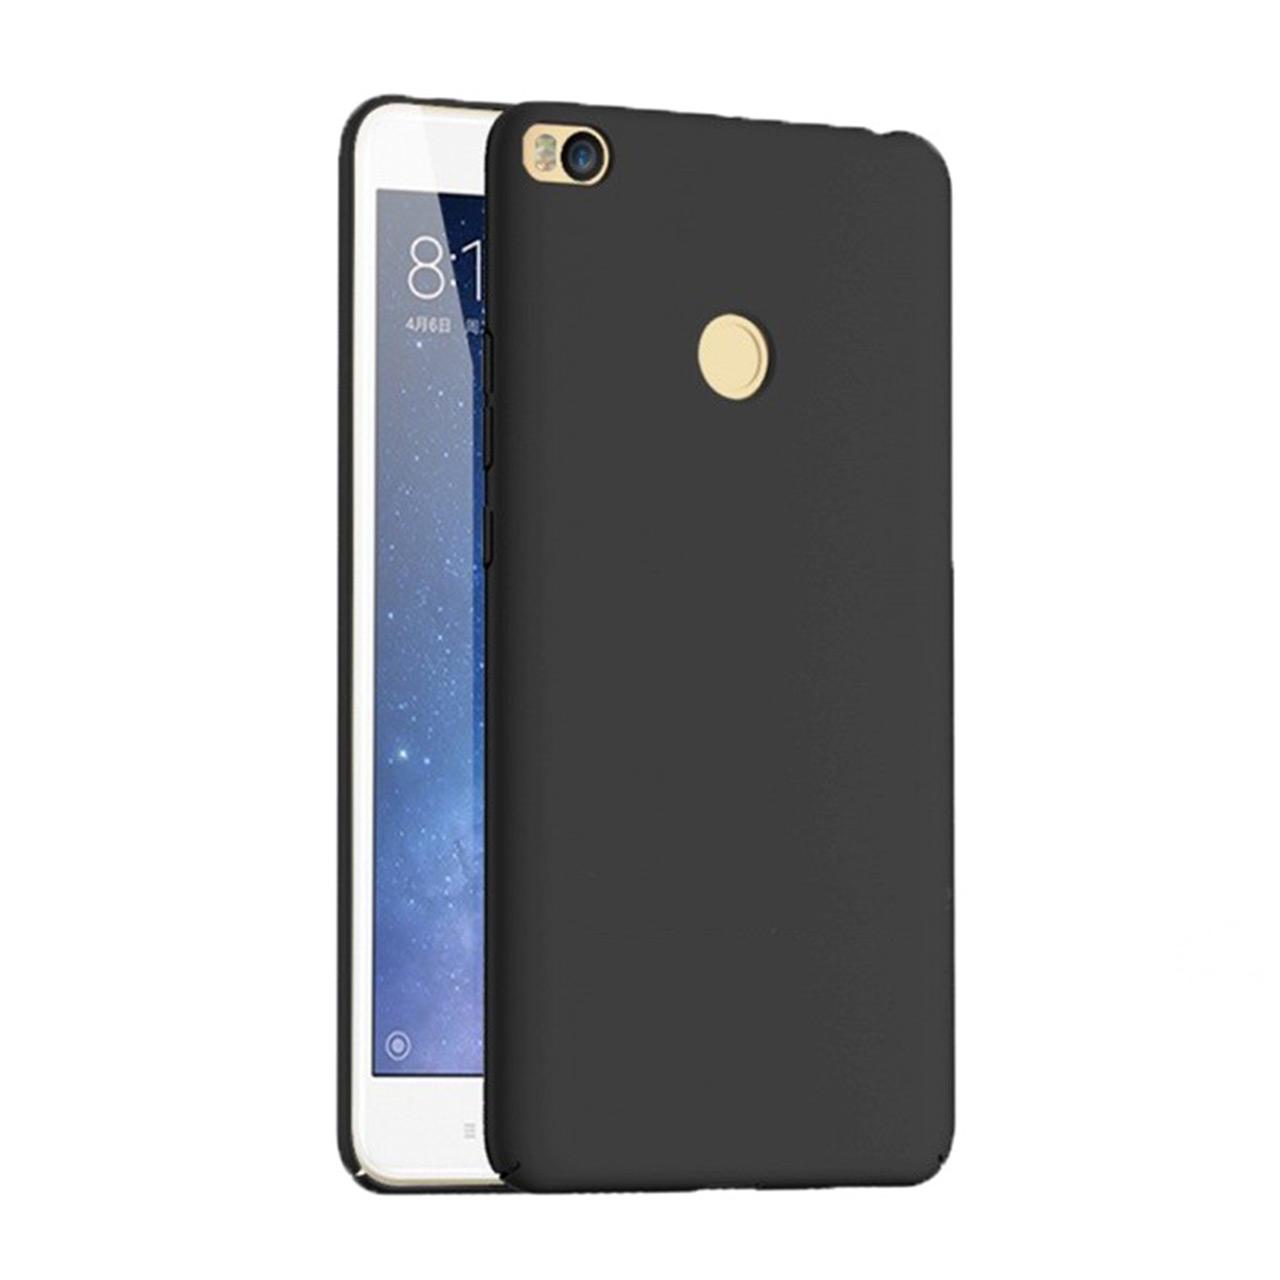 كاور آيپكي مدل Hard Case مناسب براي گوشي موبايل Xiaomi Mi Max 2